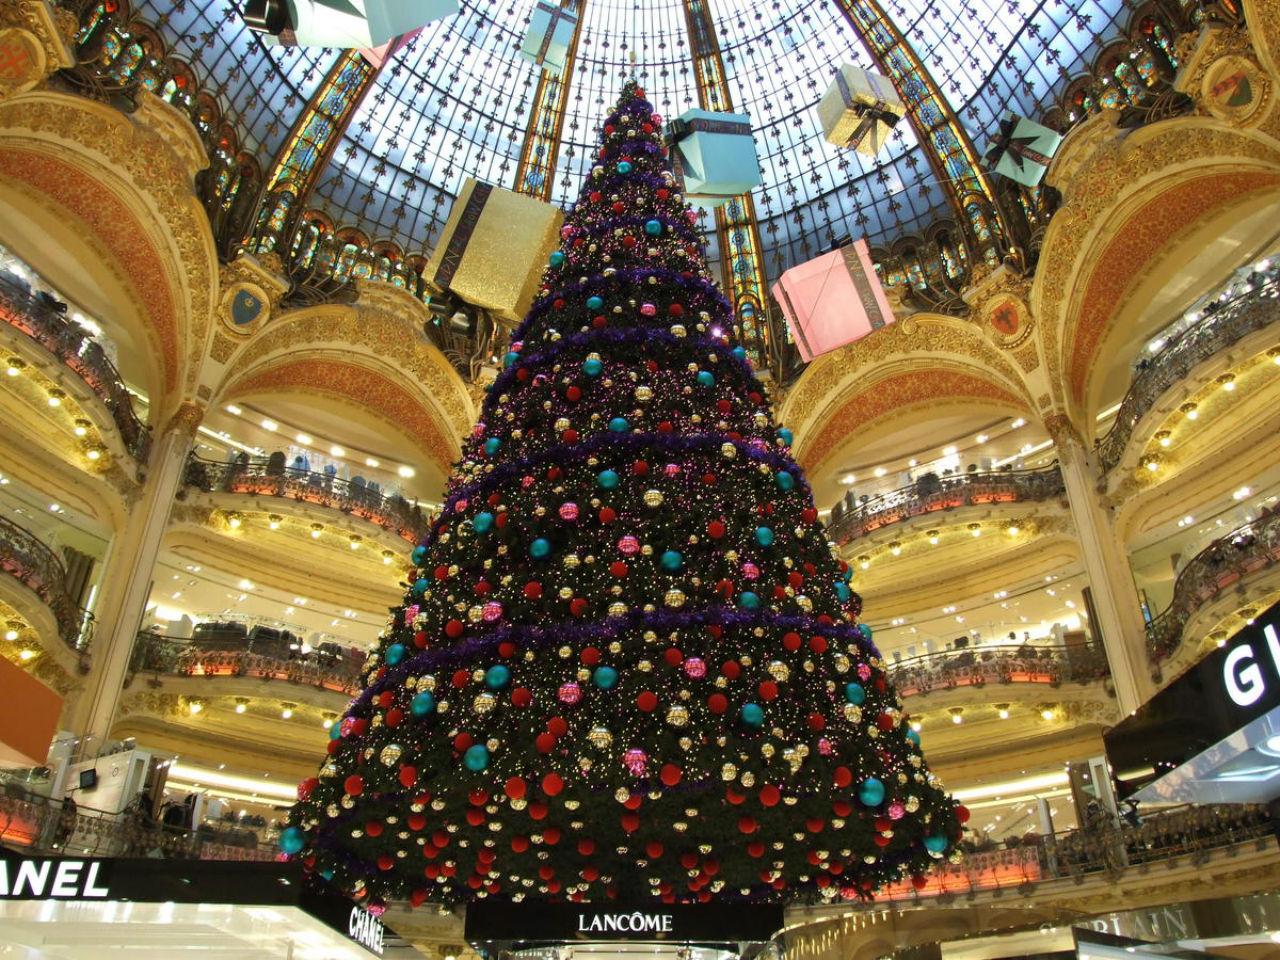 Рождественская-ёлка-в-Париже - Galeries Lafayette.jpg